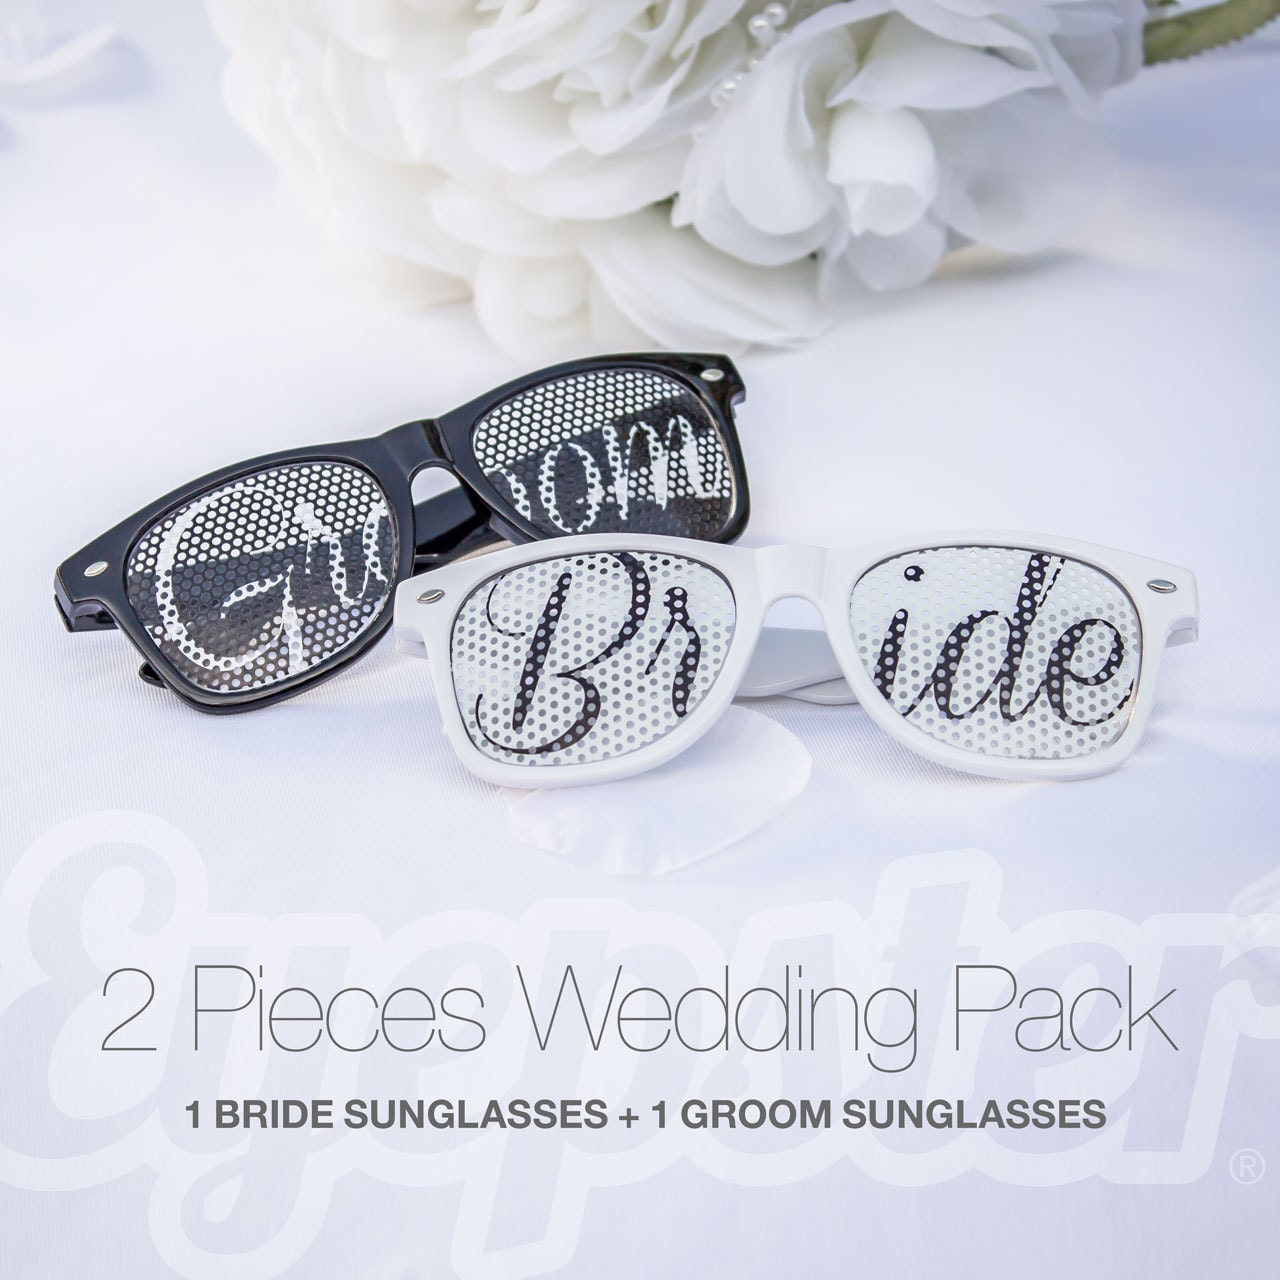 BRIDE & GROOM Retro Party Wedding Sunglasses PACK